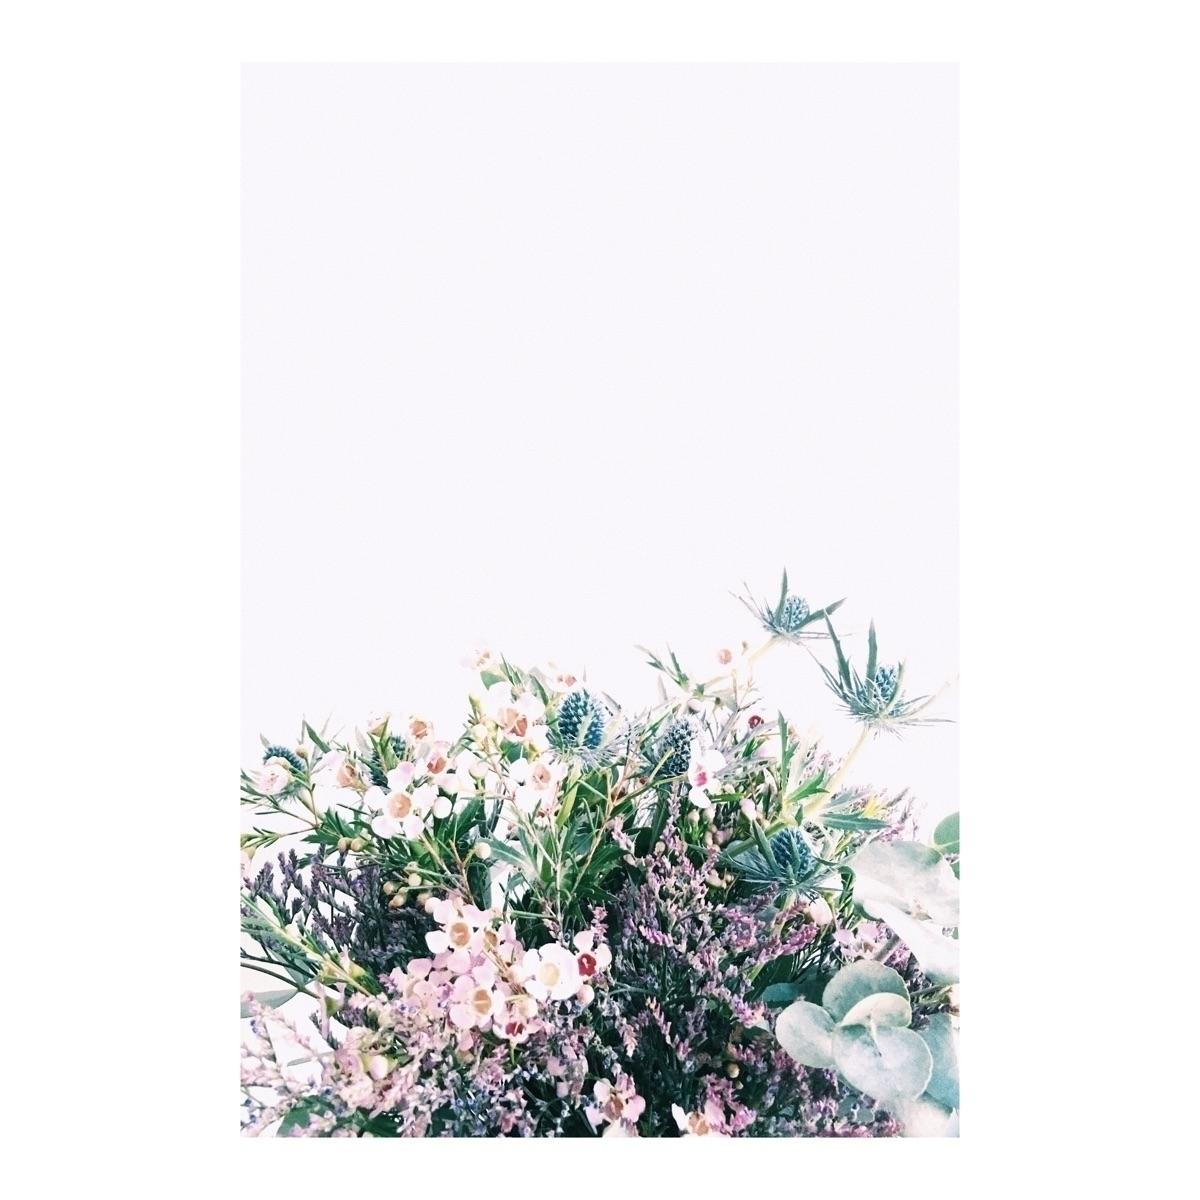 Spring | - flowers, happy, spring - rikkewestesen | ello